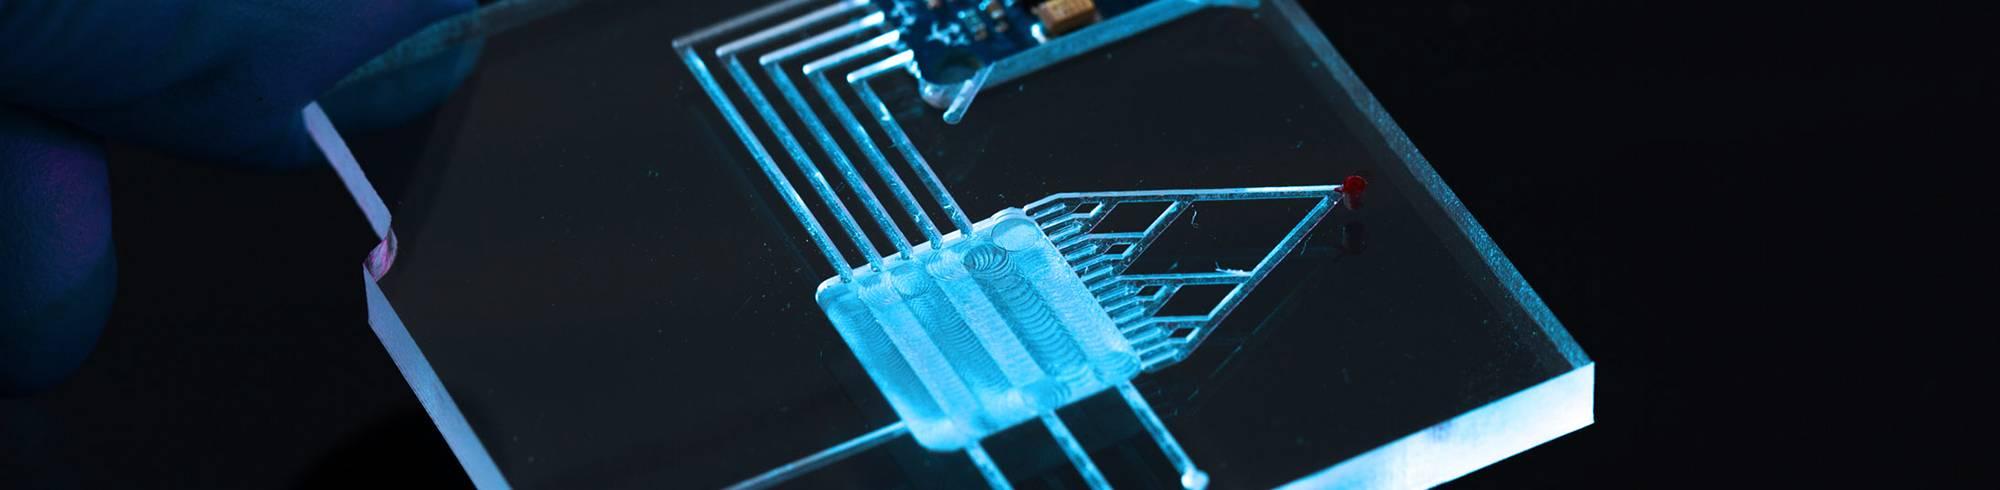 medical adhesives used for In-vitro diagnostics